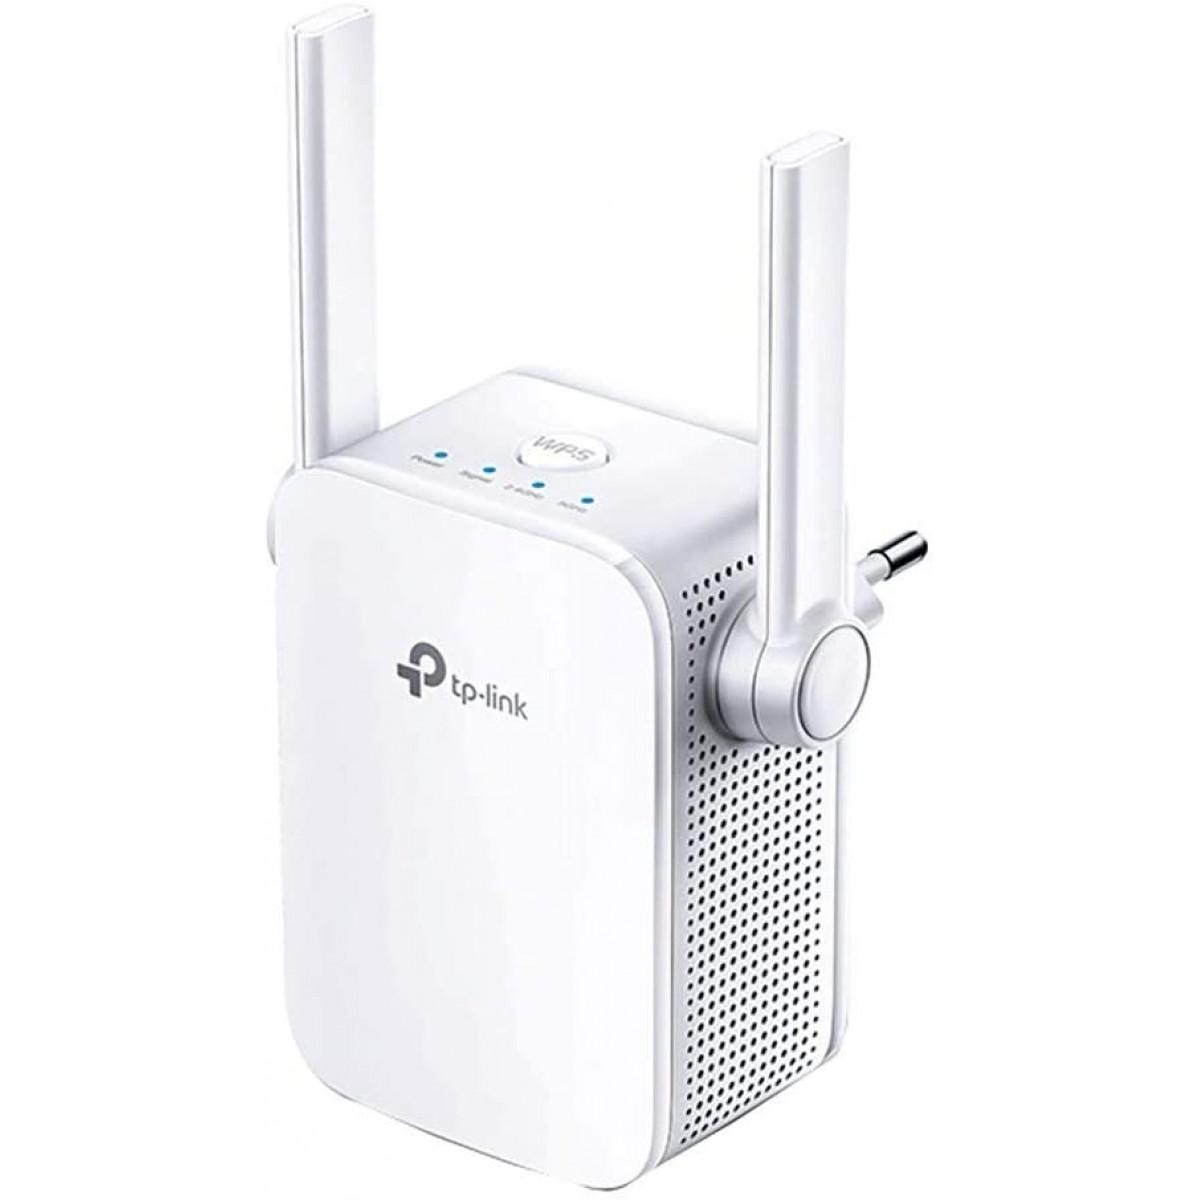 Repetidor TP-Link, RE305, Dual Band, AC1200, 2 antenas, ext, RE305